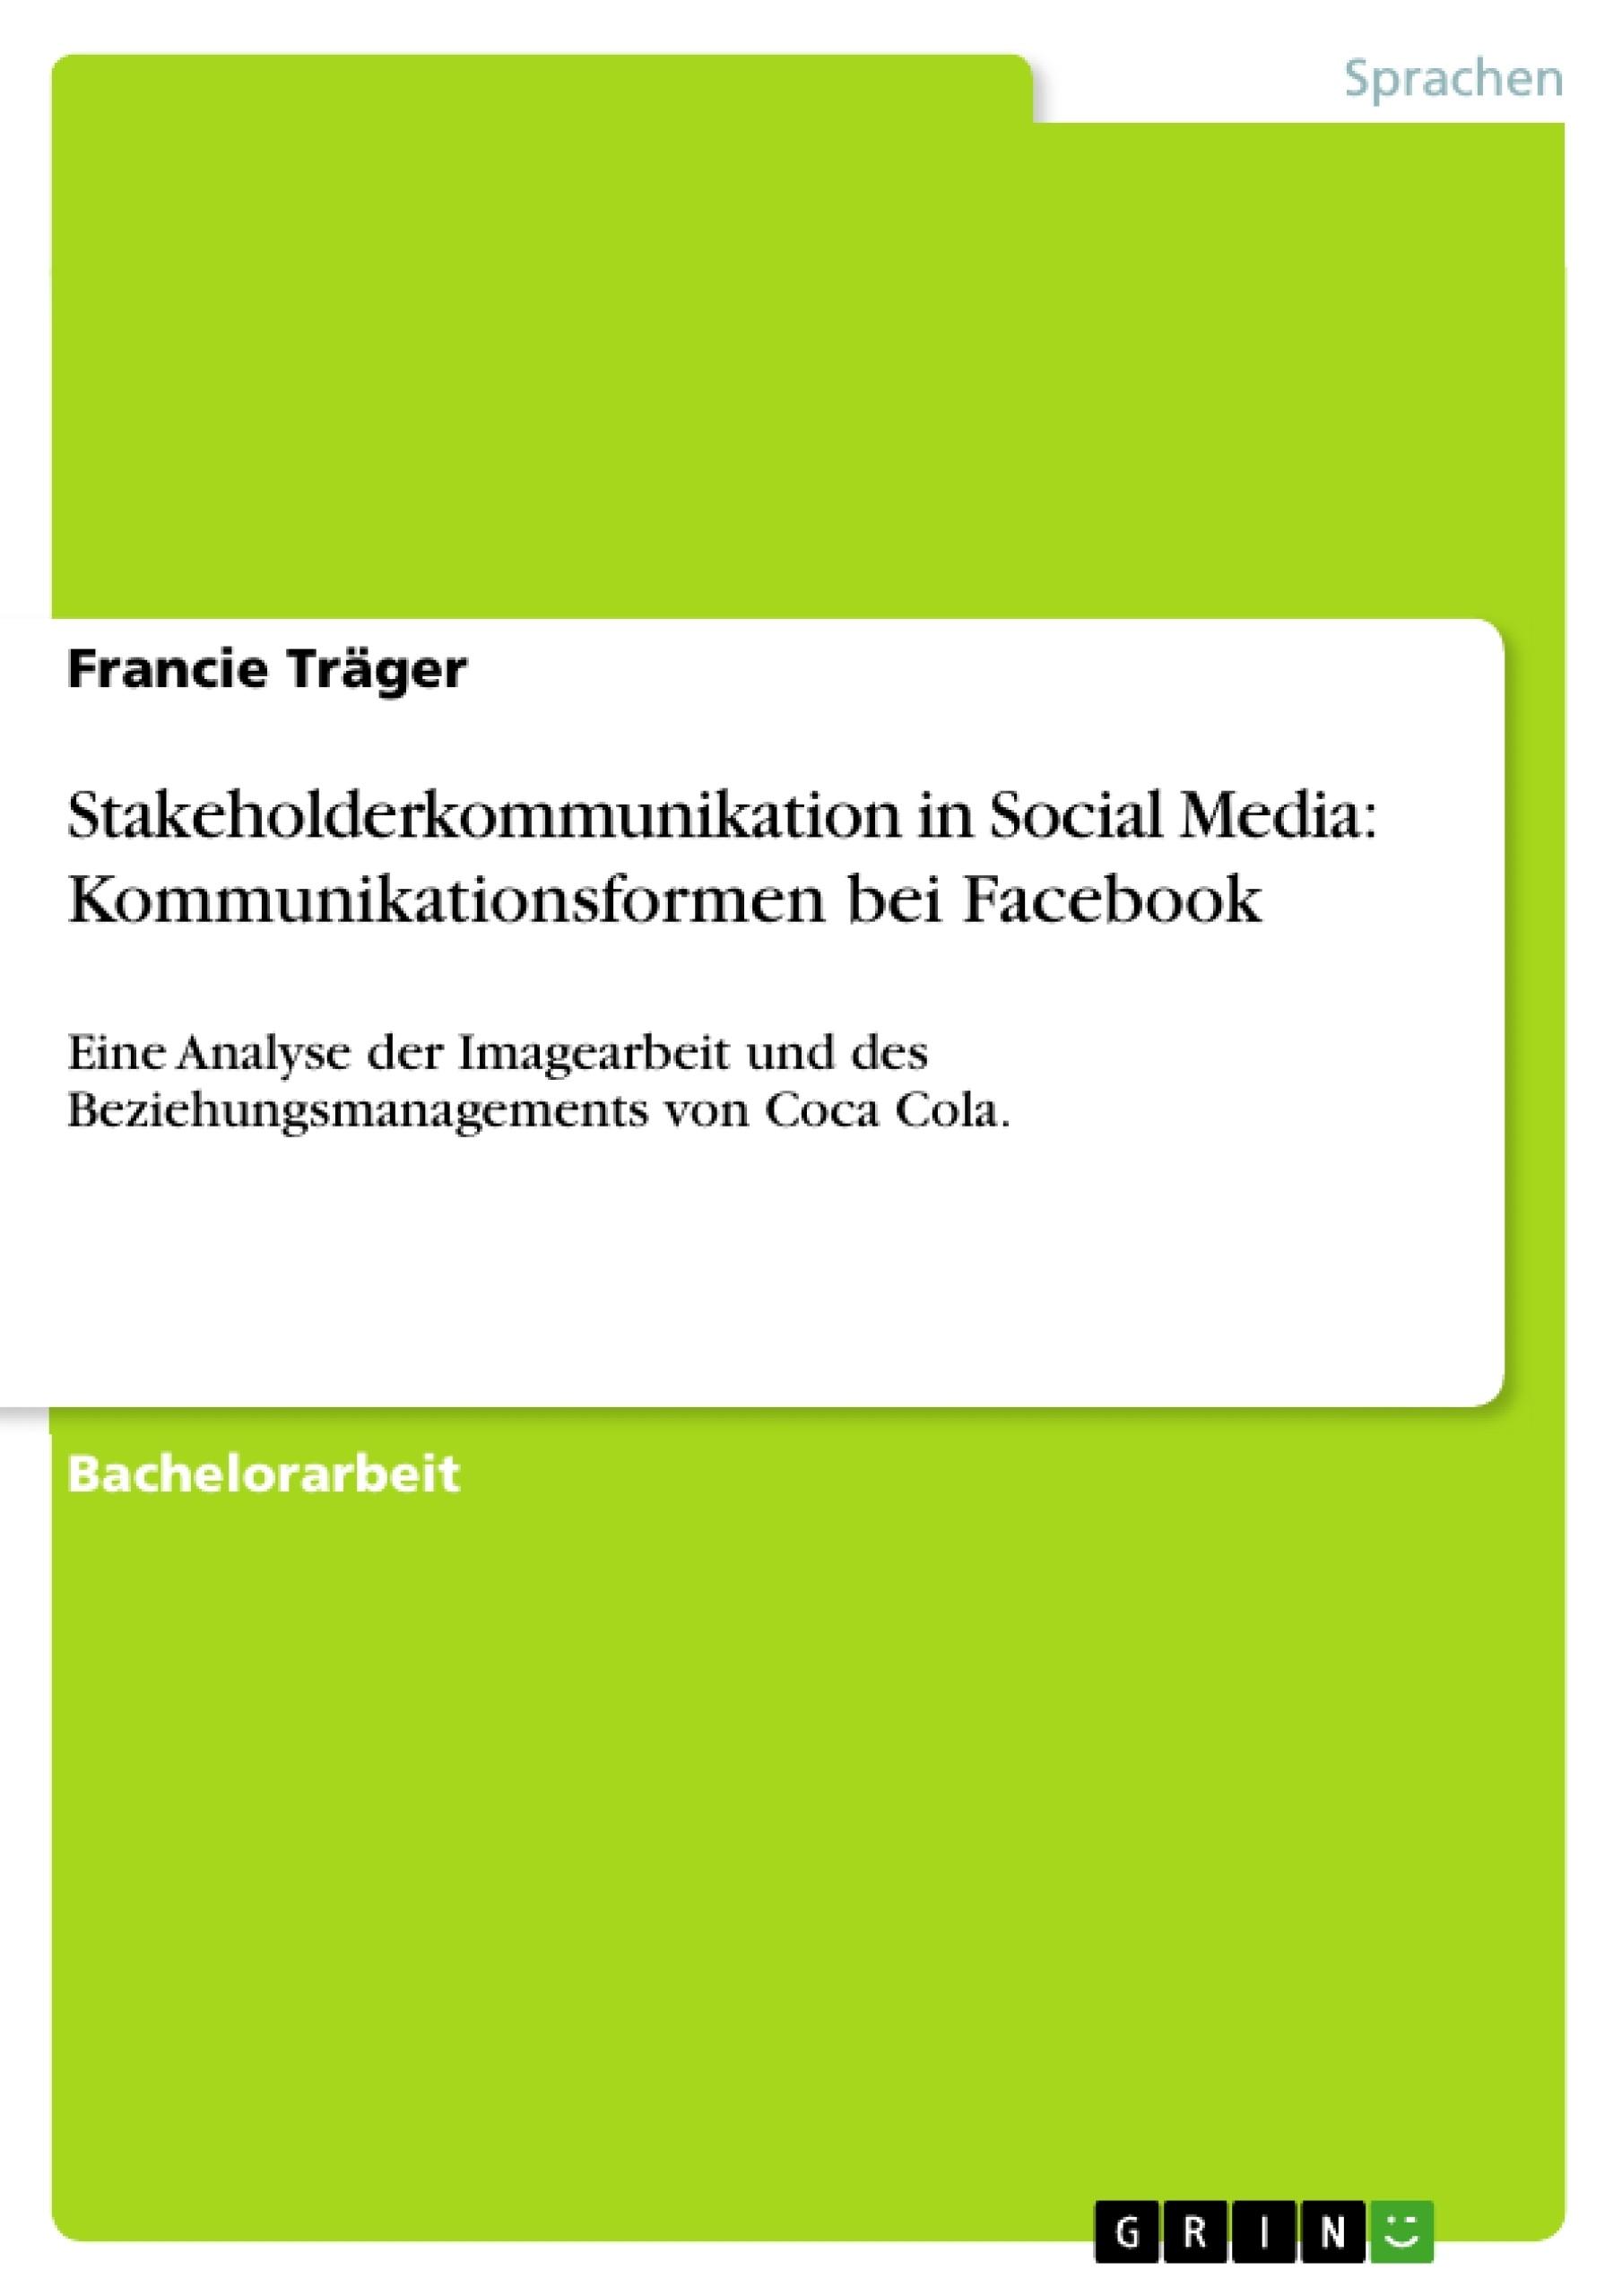 Titel: Stakeholderkommunikation in Social Media: Kommunikationsformen bei Facebook